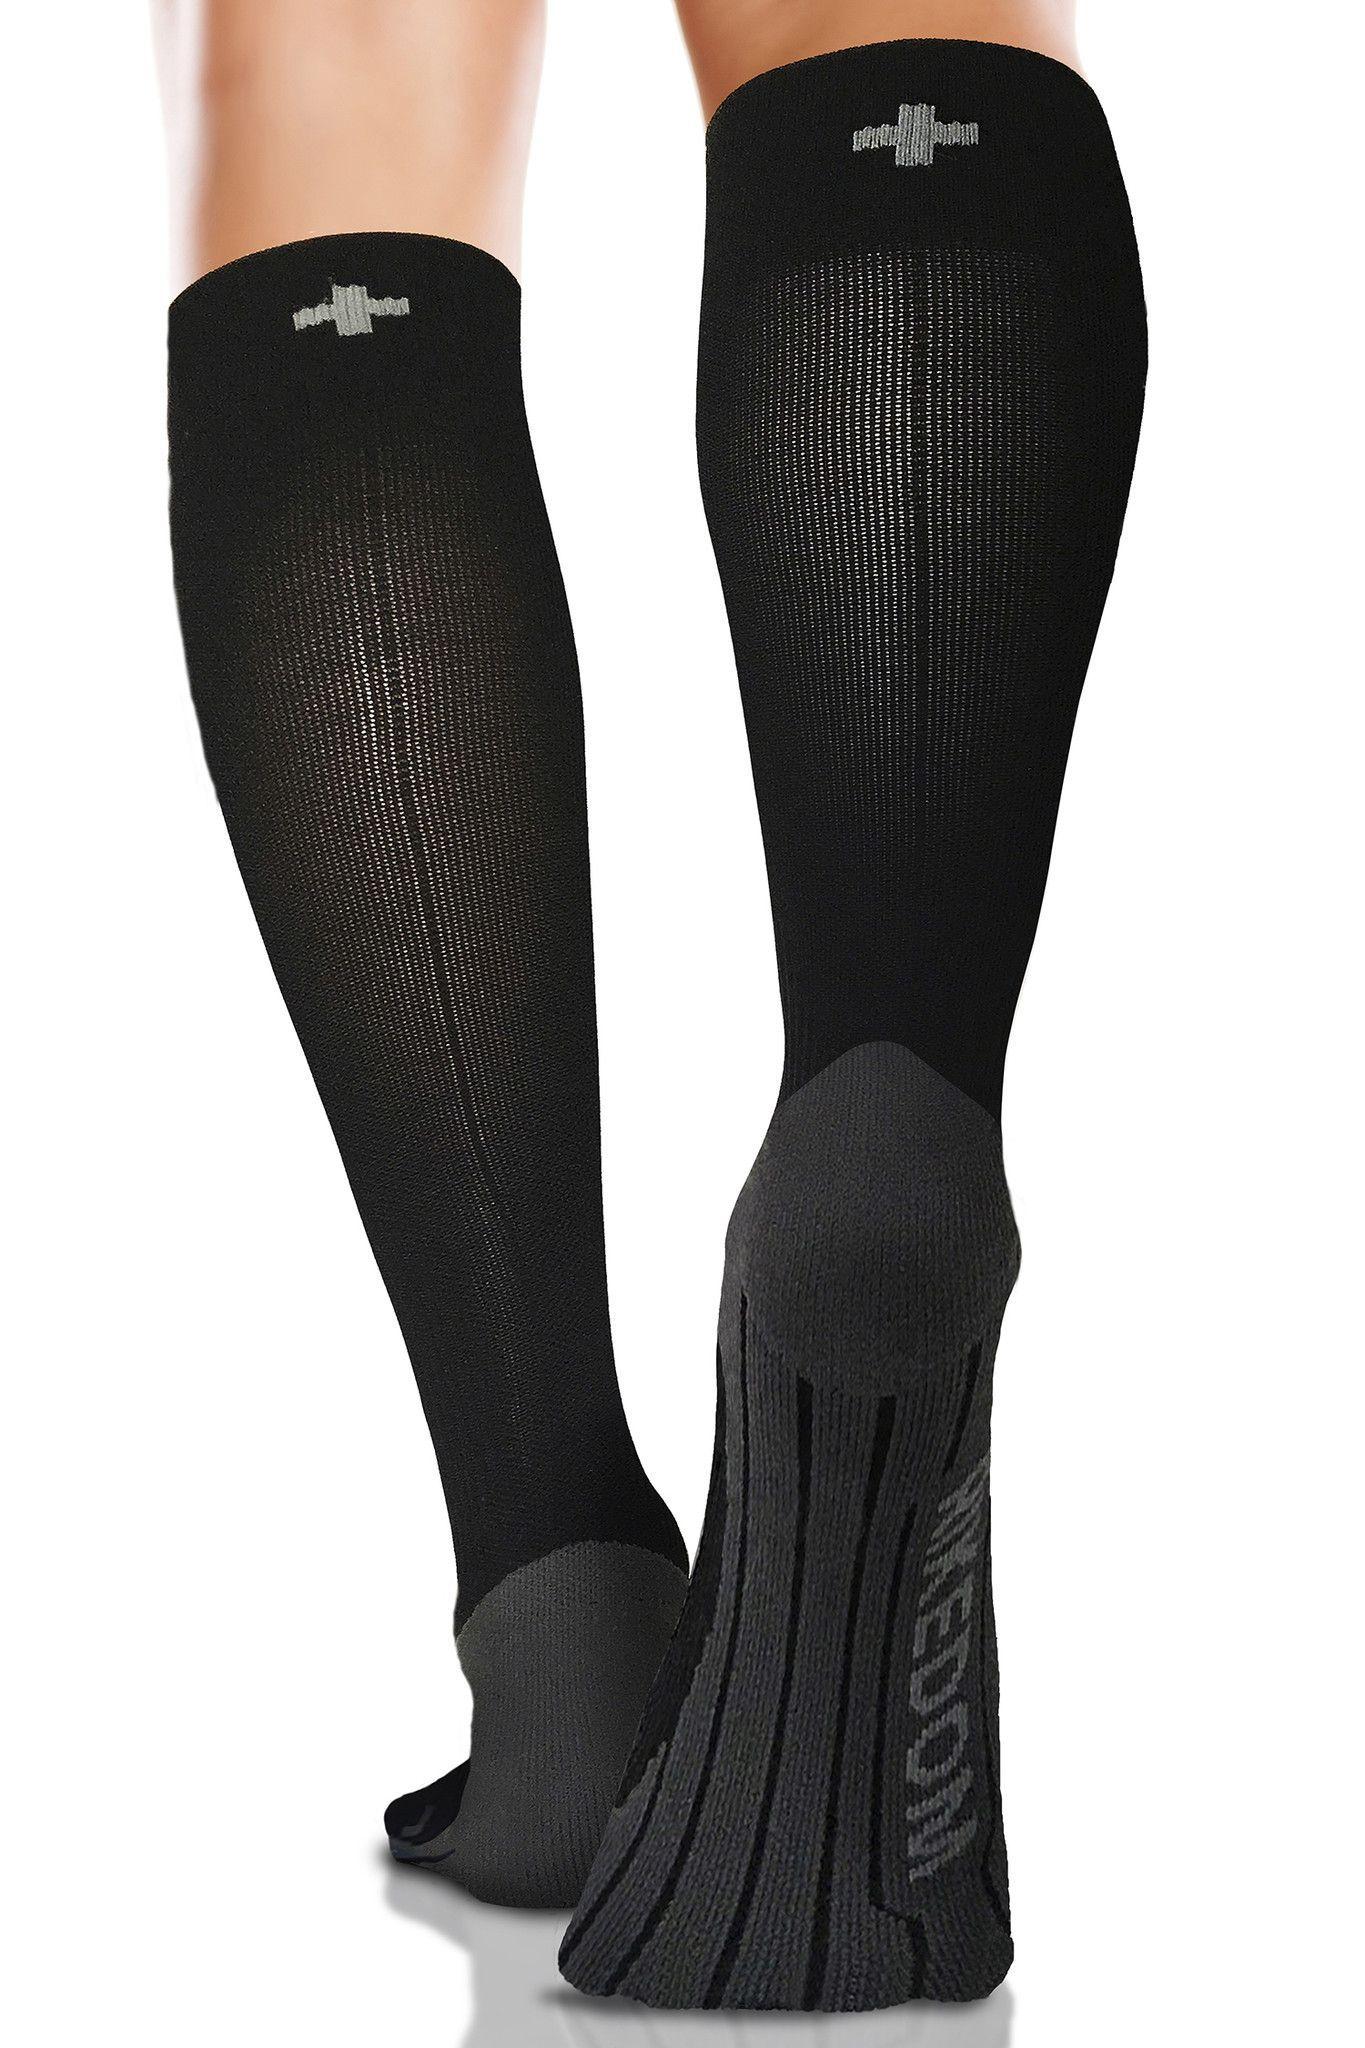 Graduated Compression Socks for Men Women